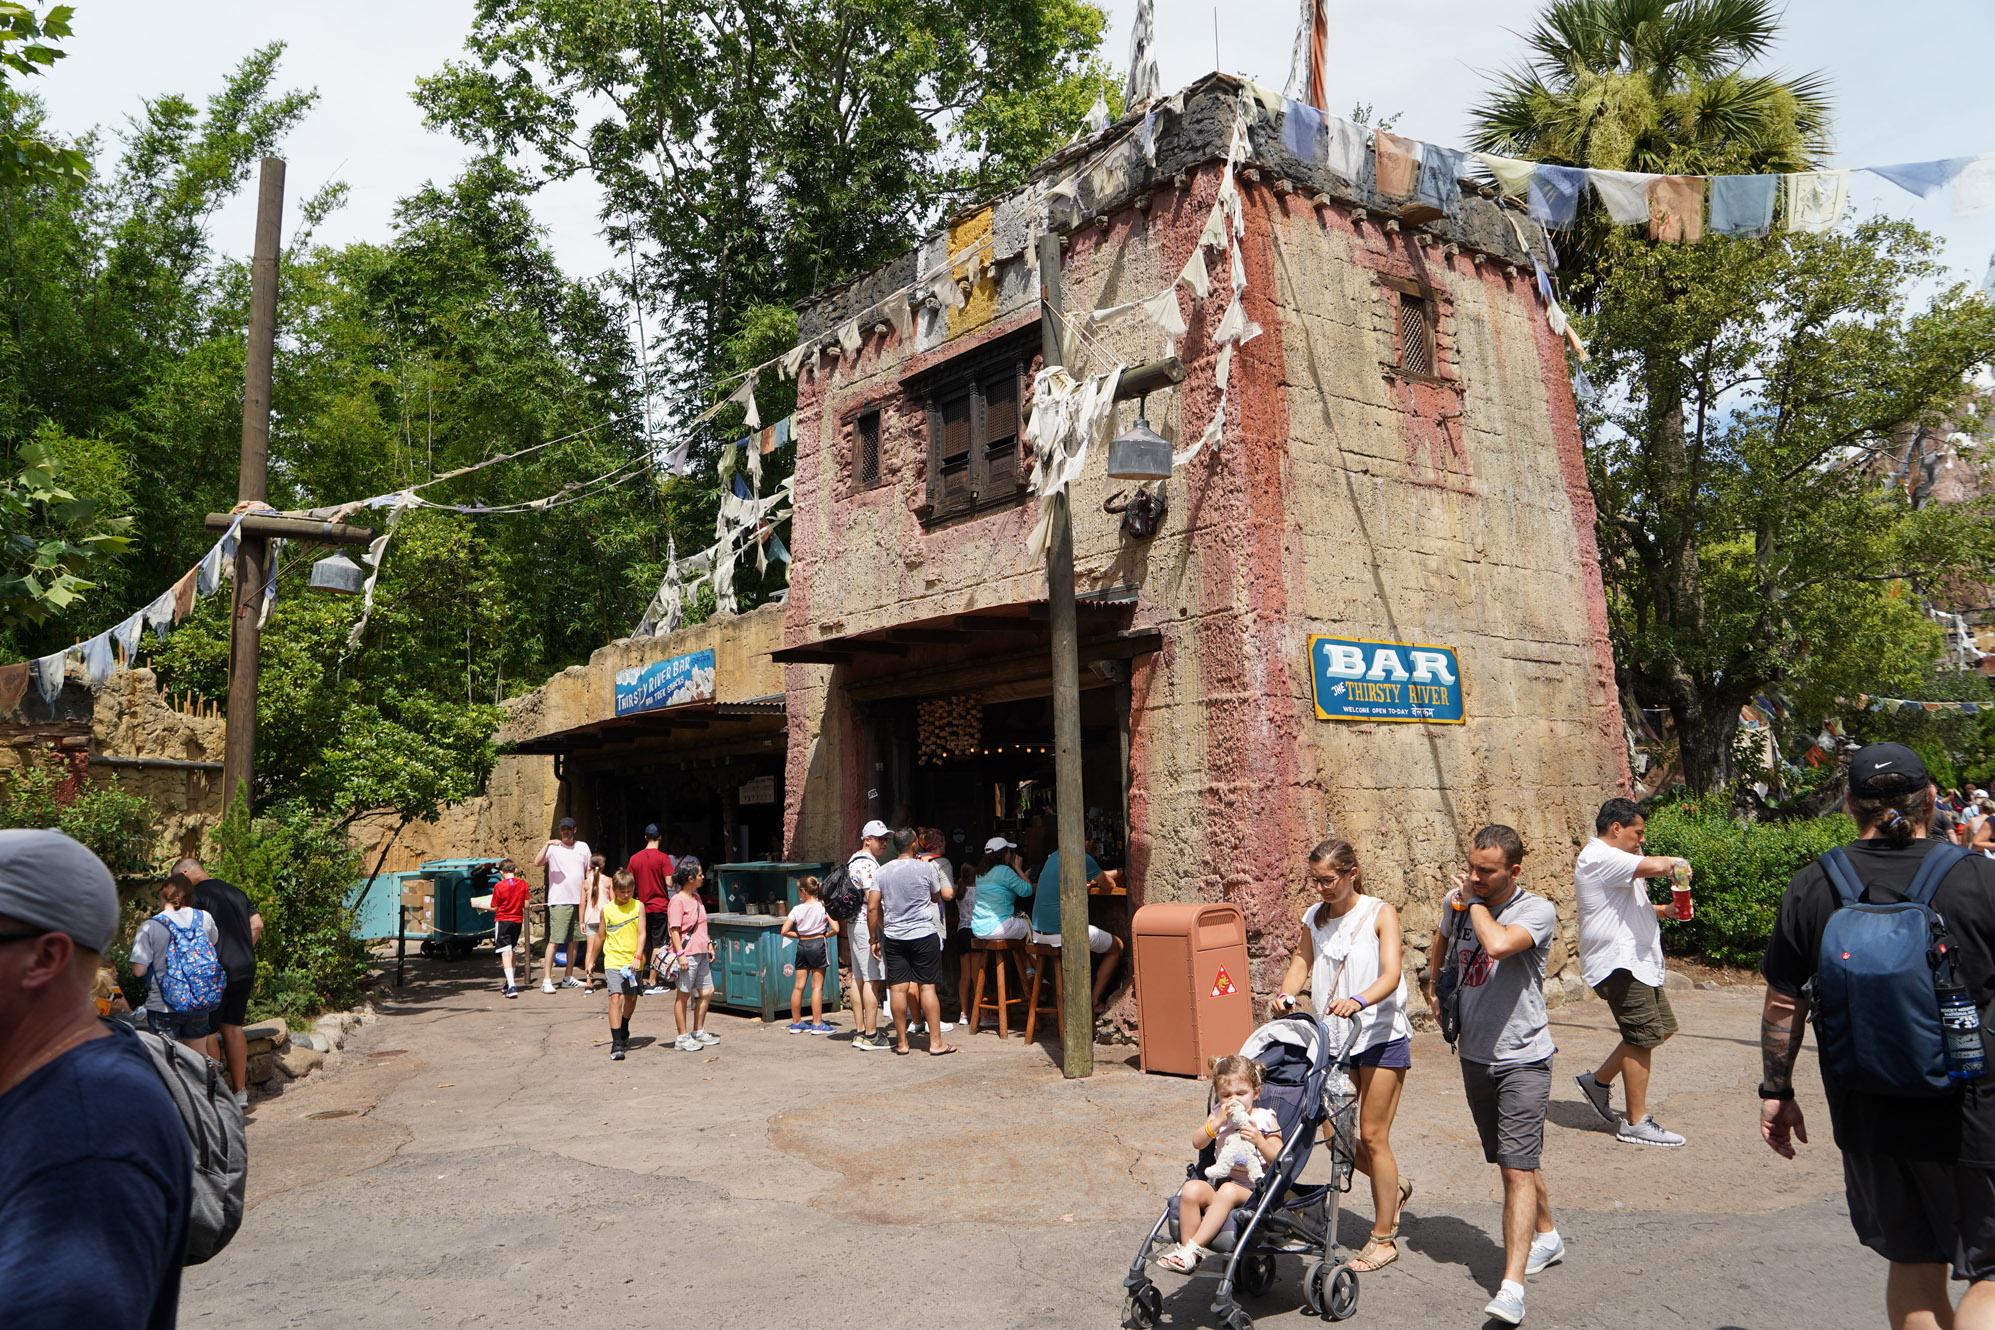 quick service animal kingdom restaurants